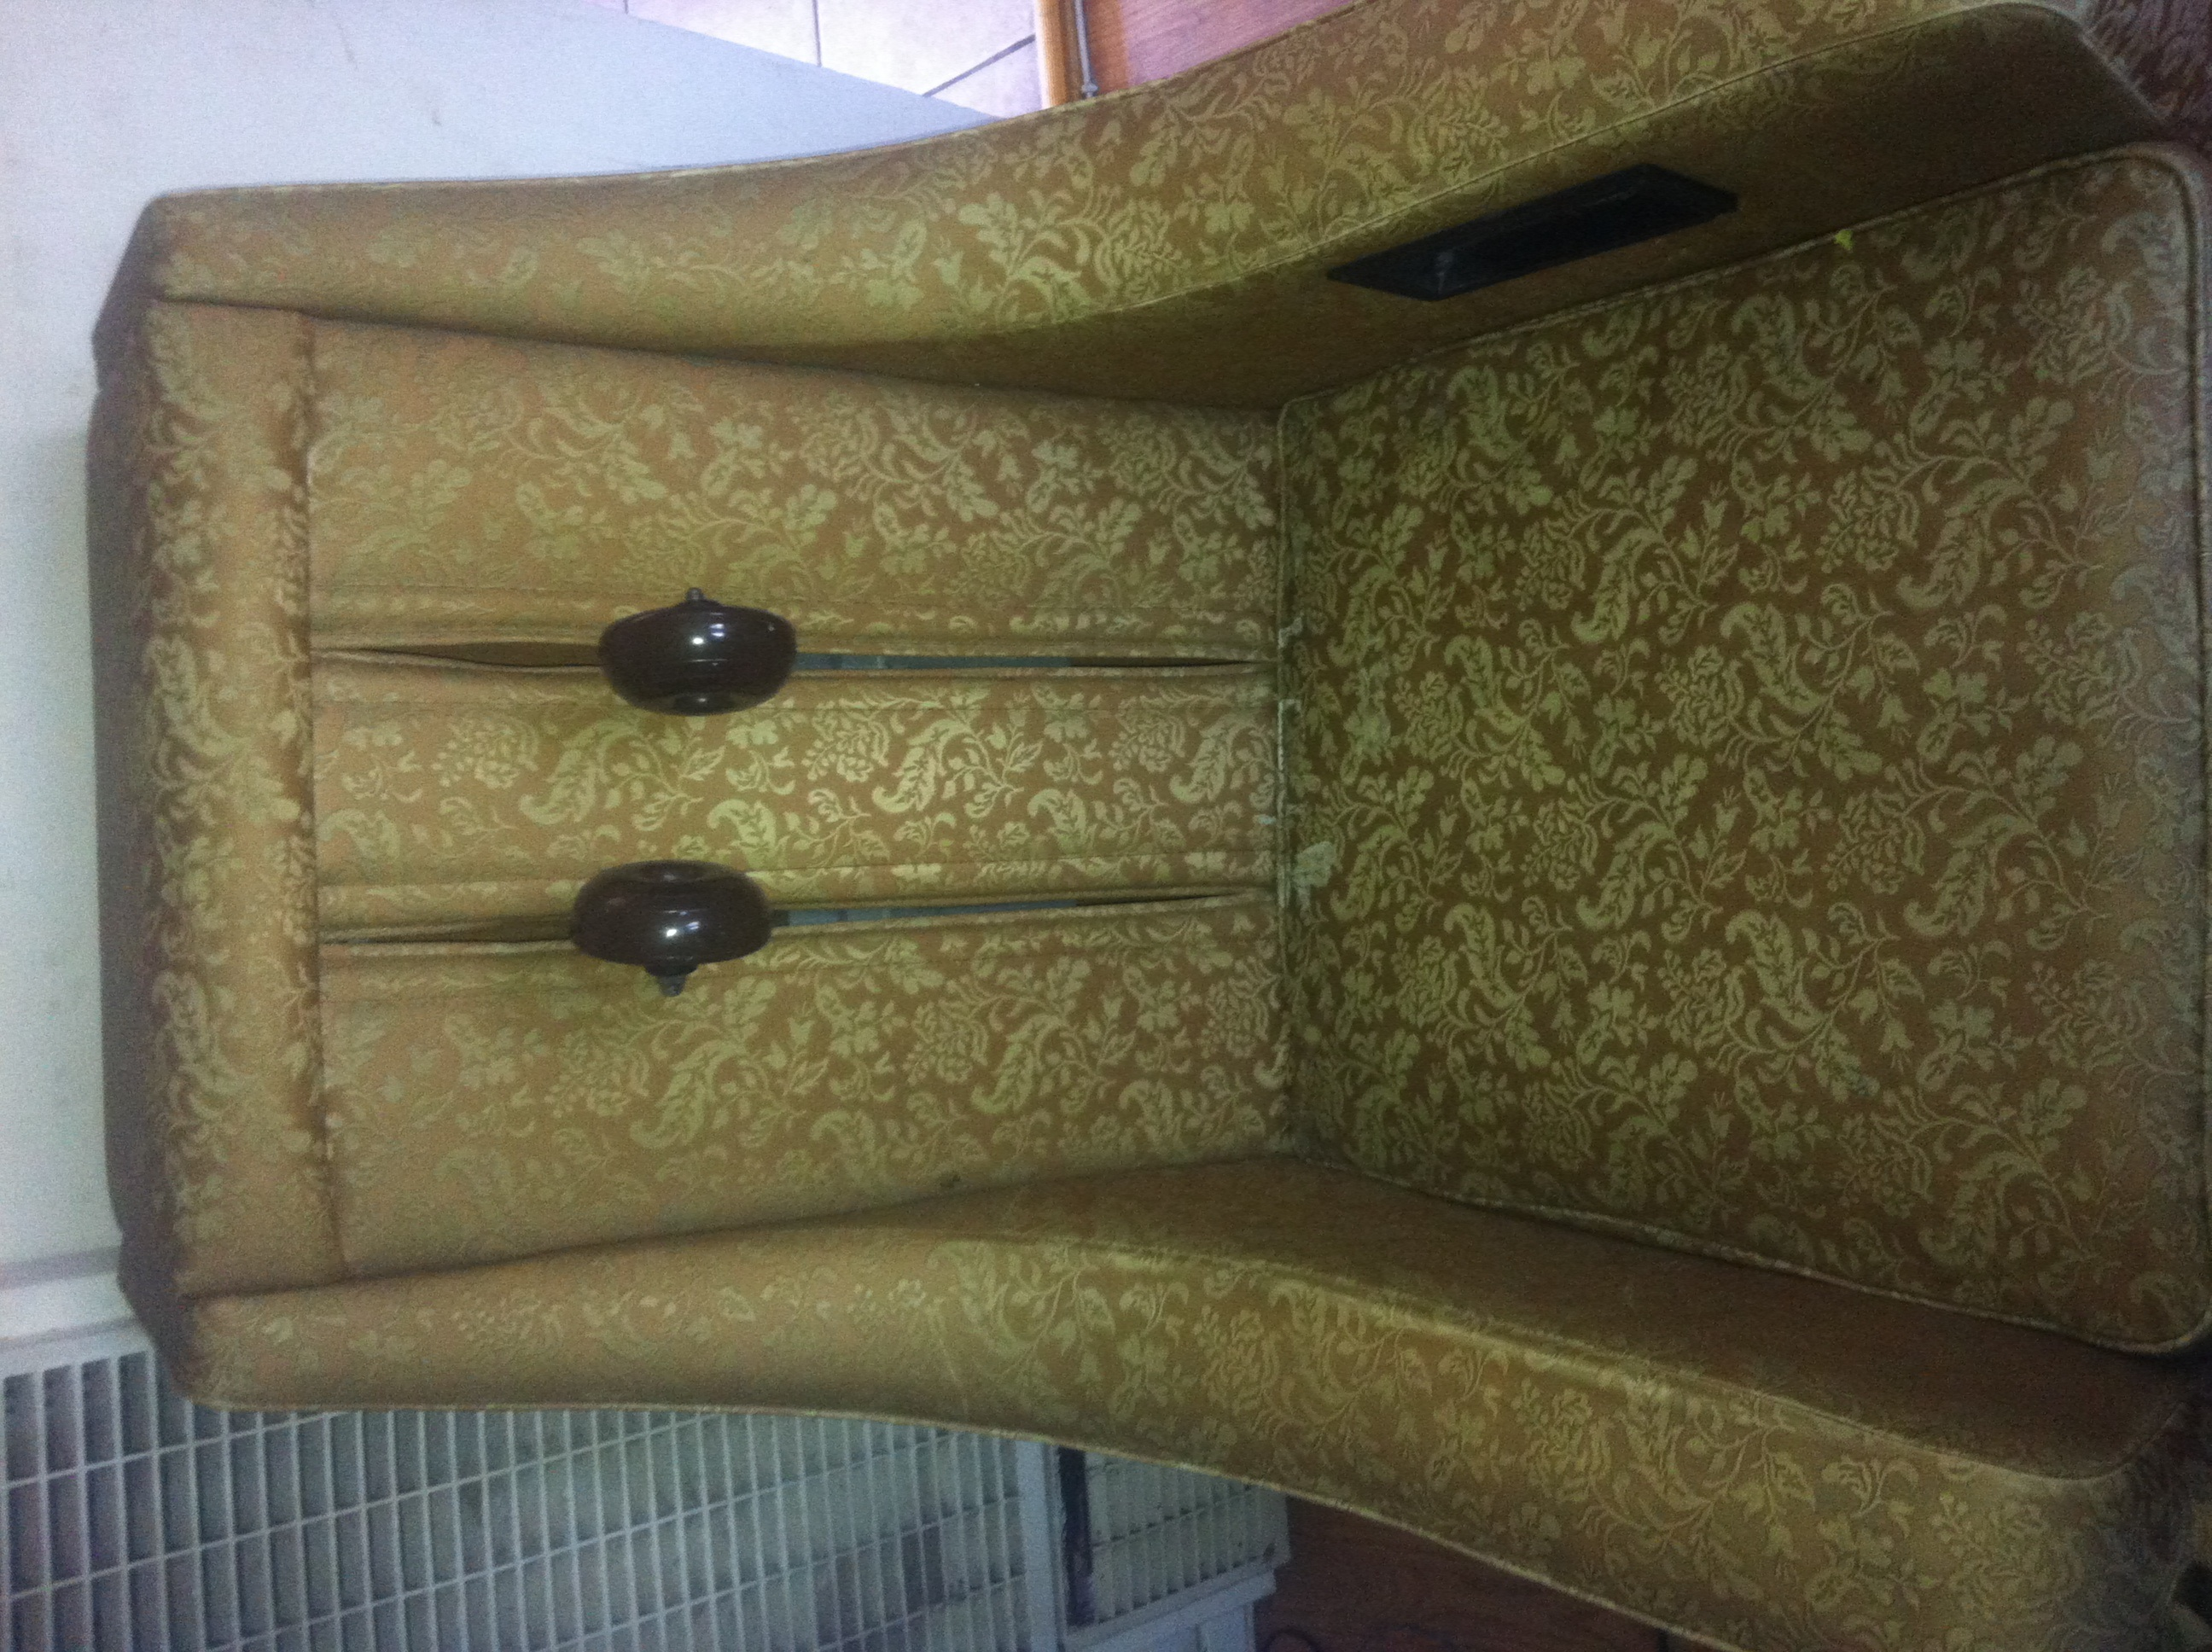 Japanese massage chair antique appraisal